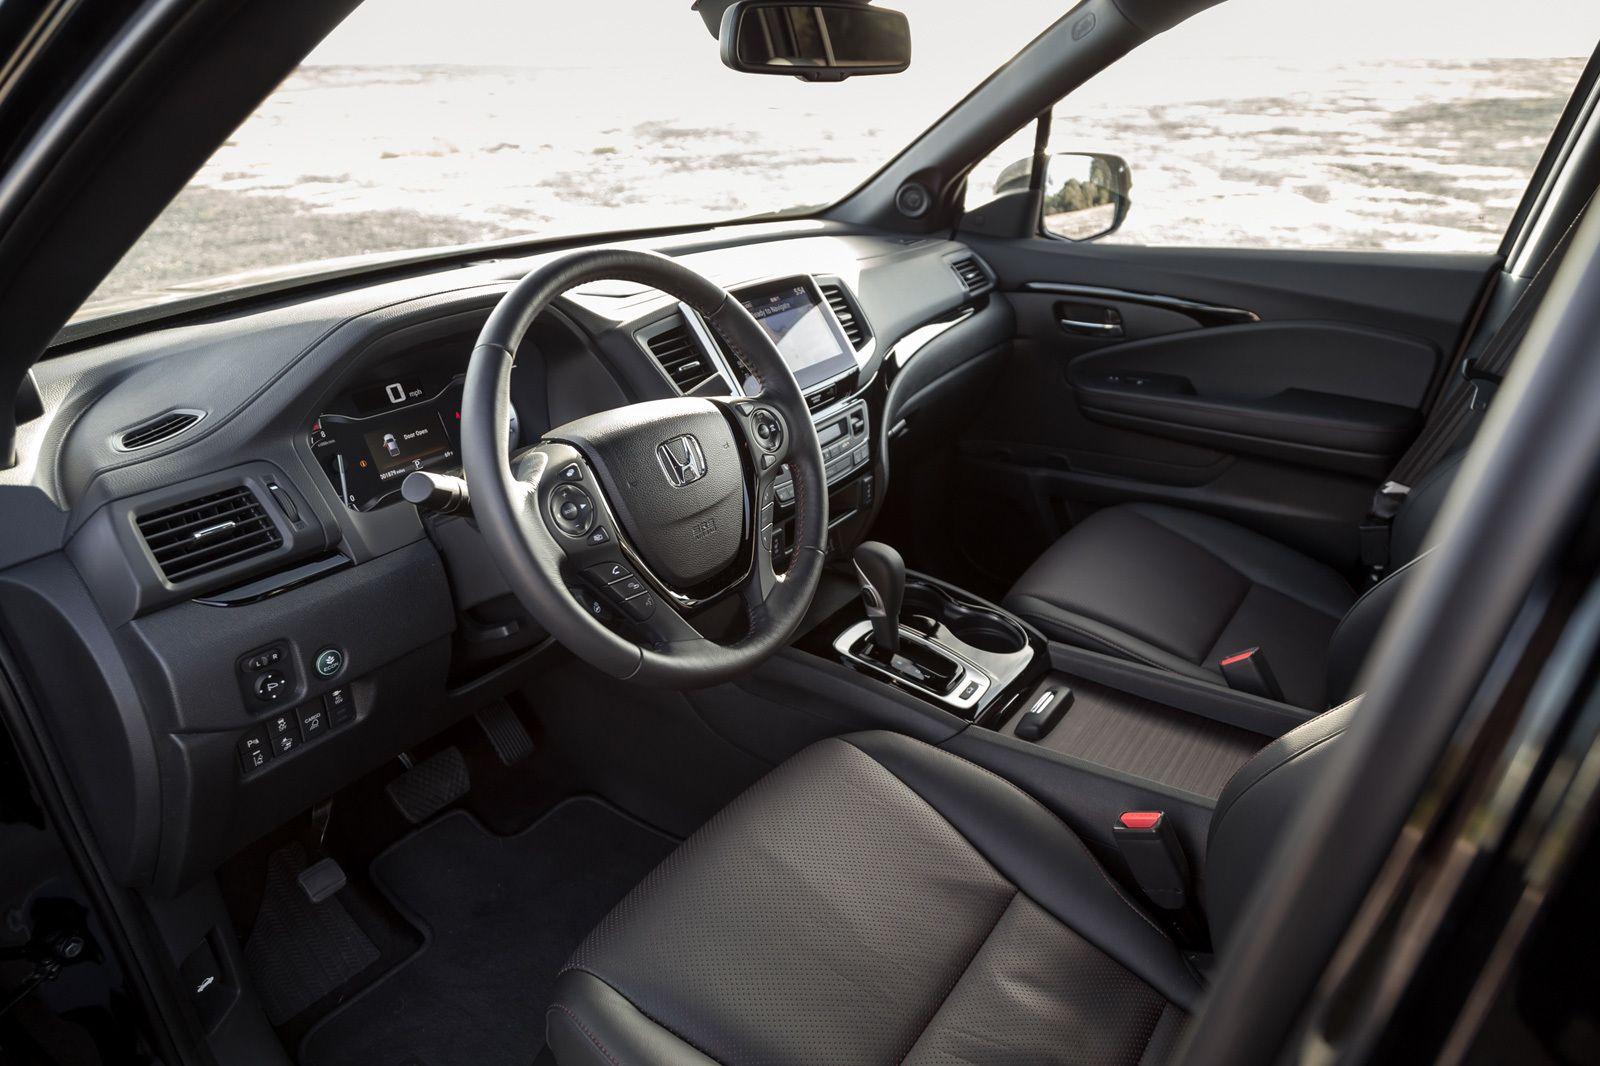 Test Drive 2017 Honda Ridgeline Honda ridgeline, Honda